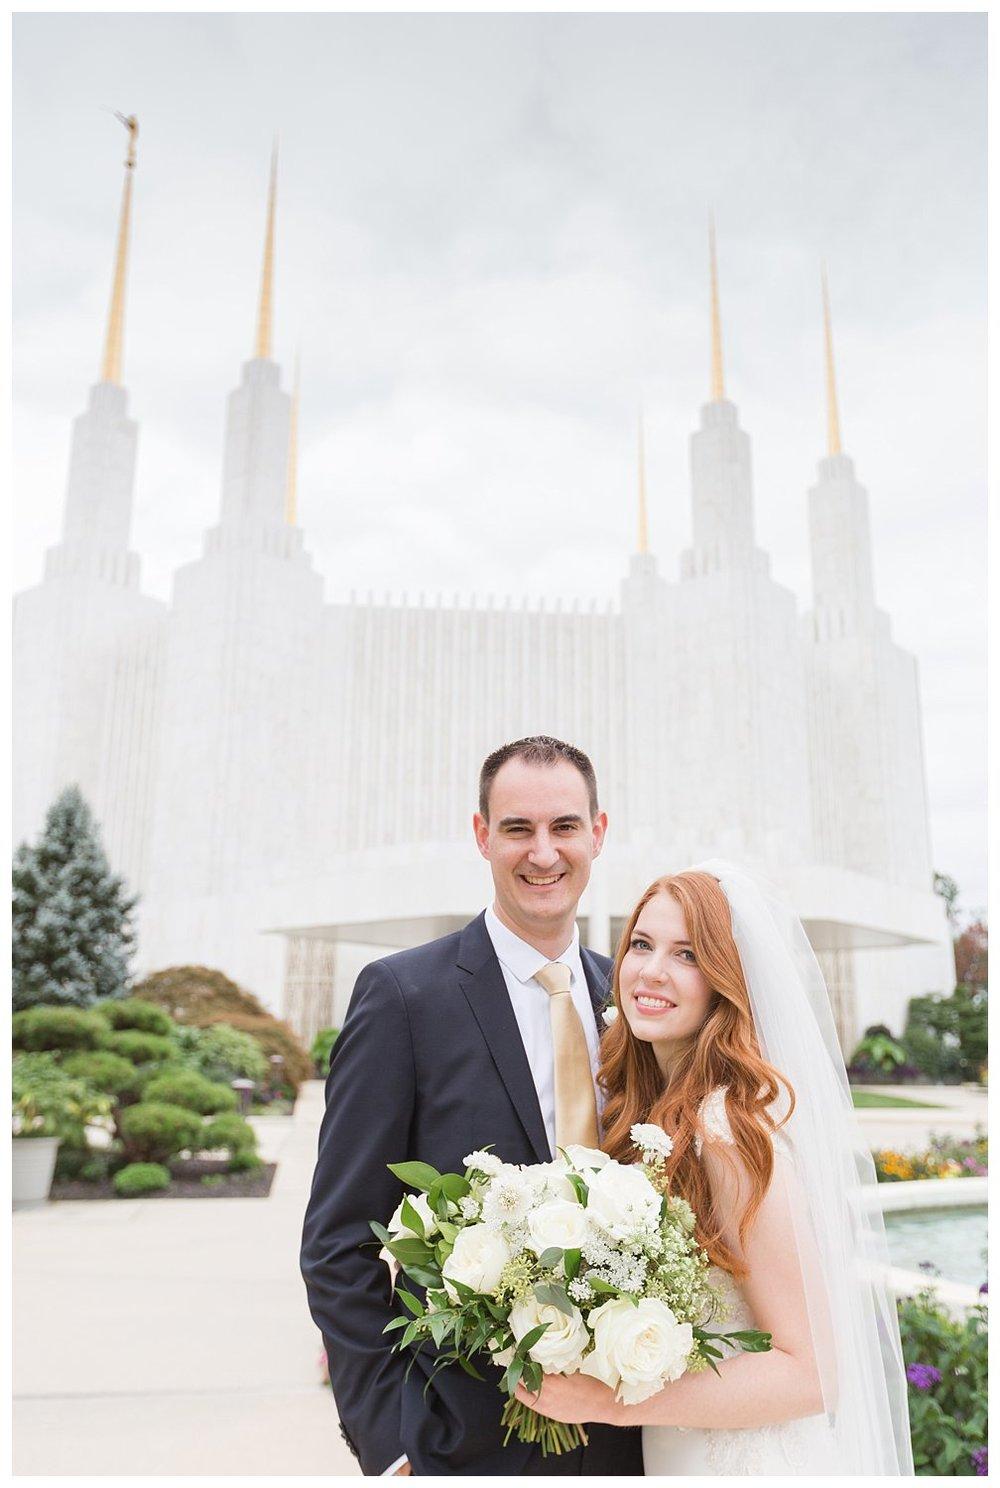 elovephotos Washington DC LDS Temple Photographer_0898.jpg